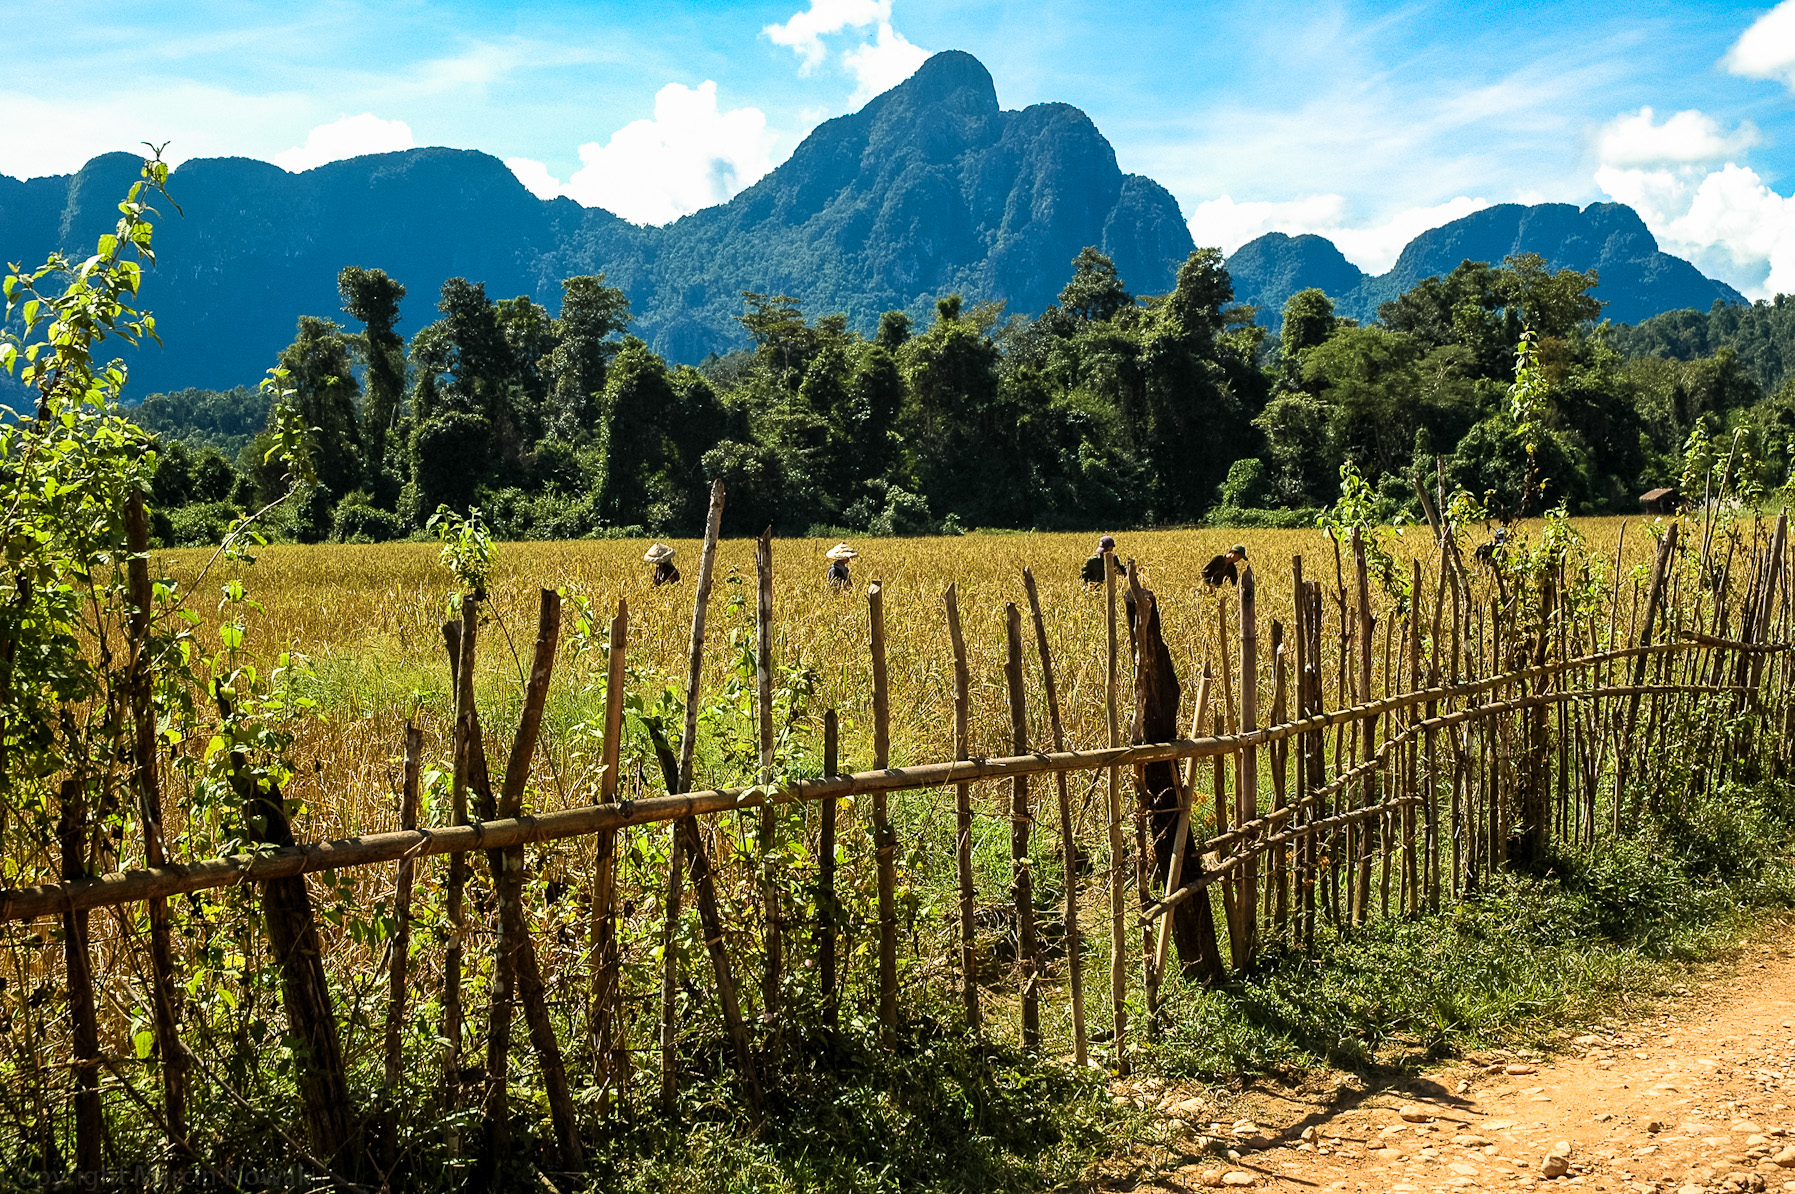 Zbiory ryżu - Laos